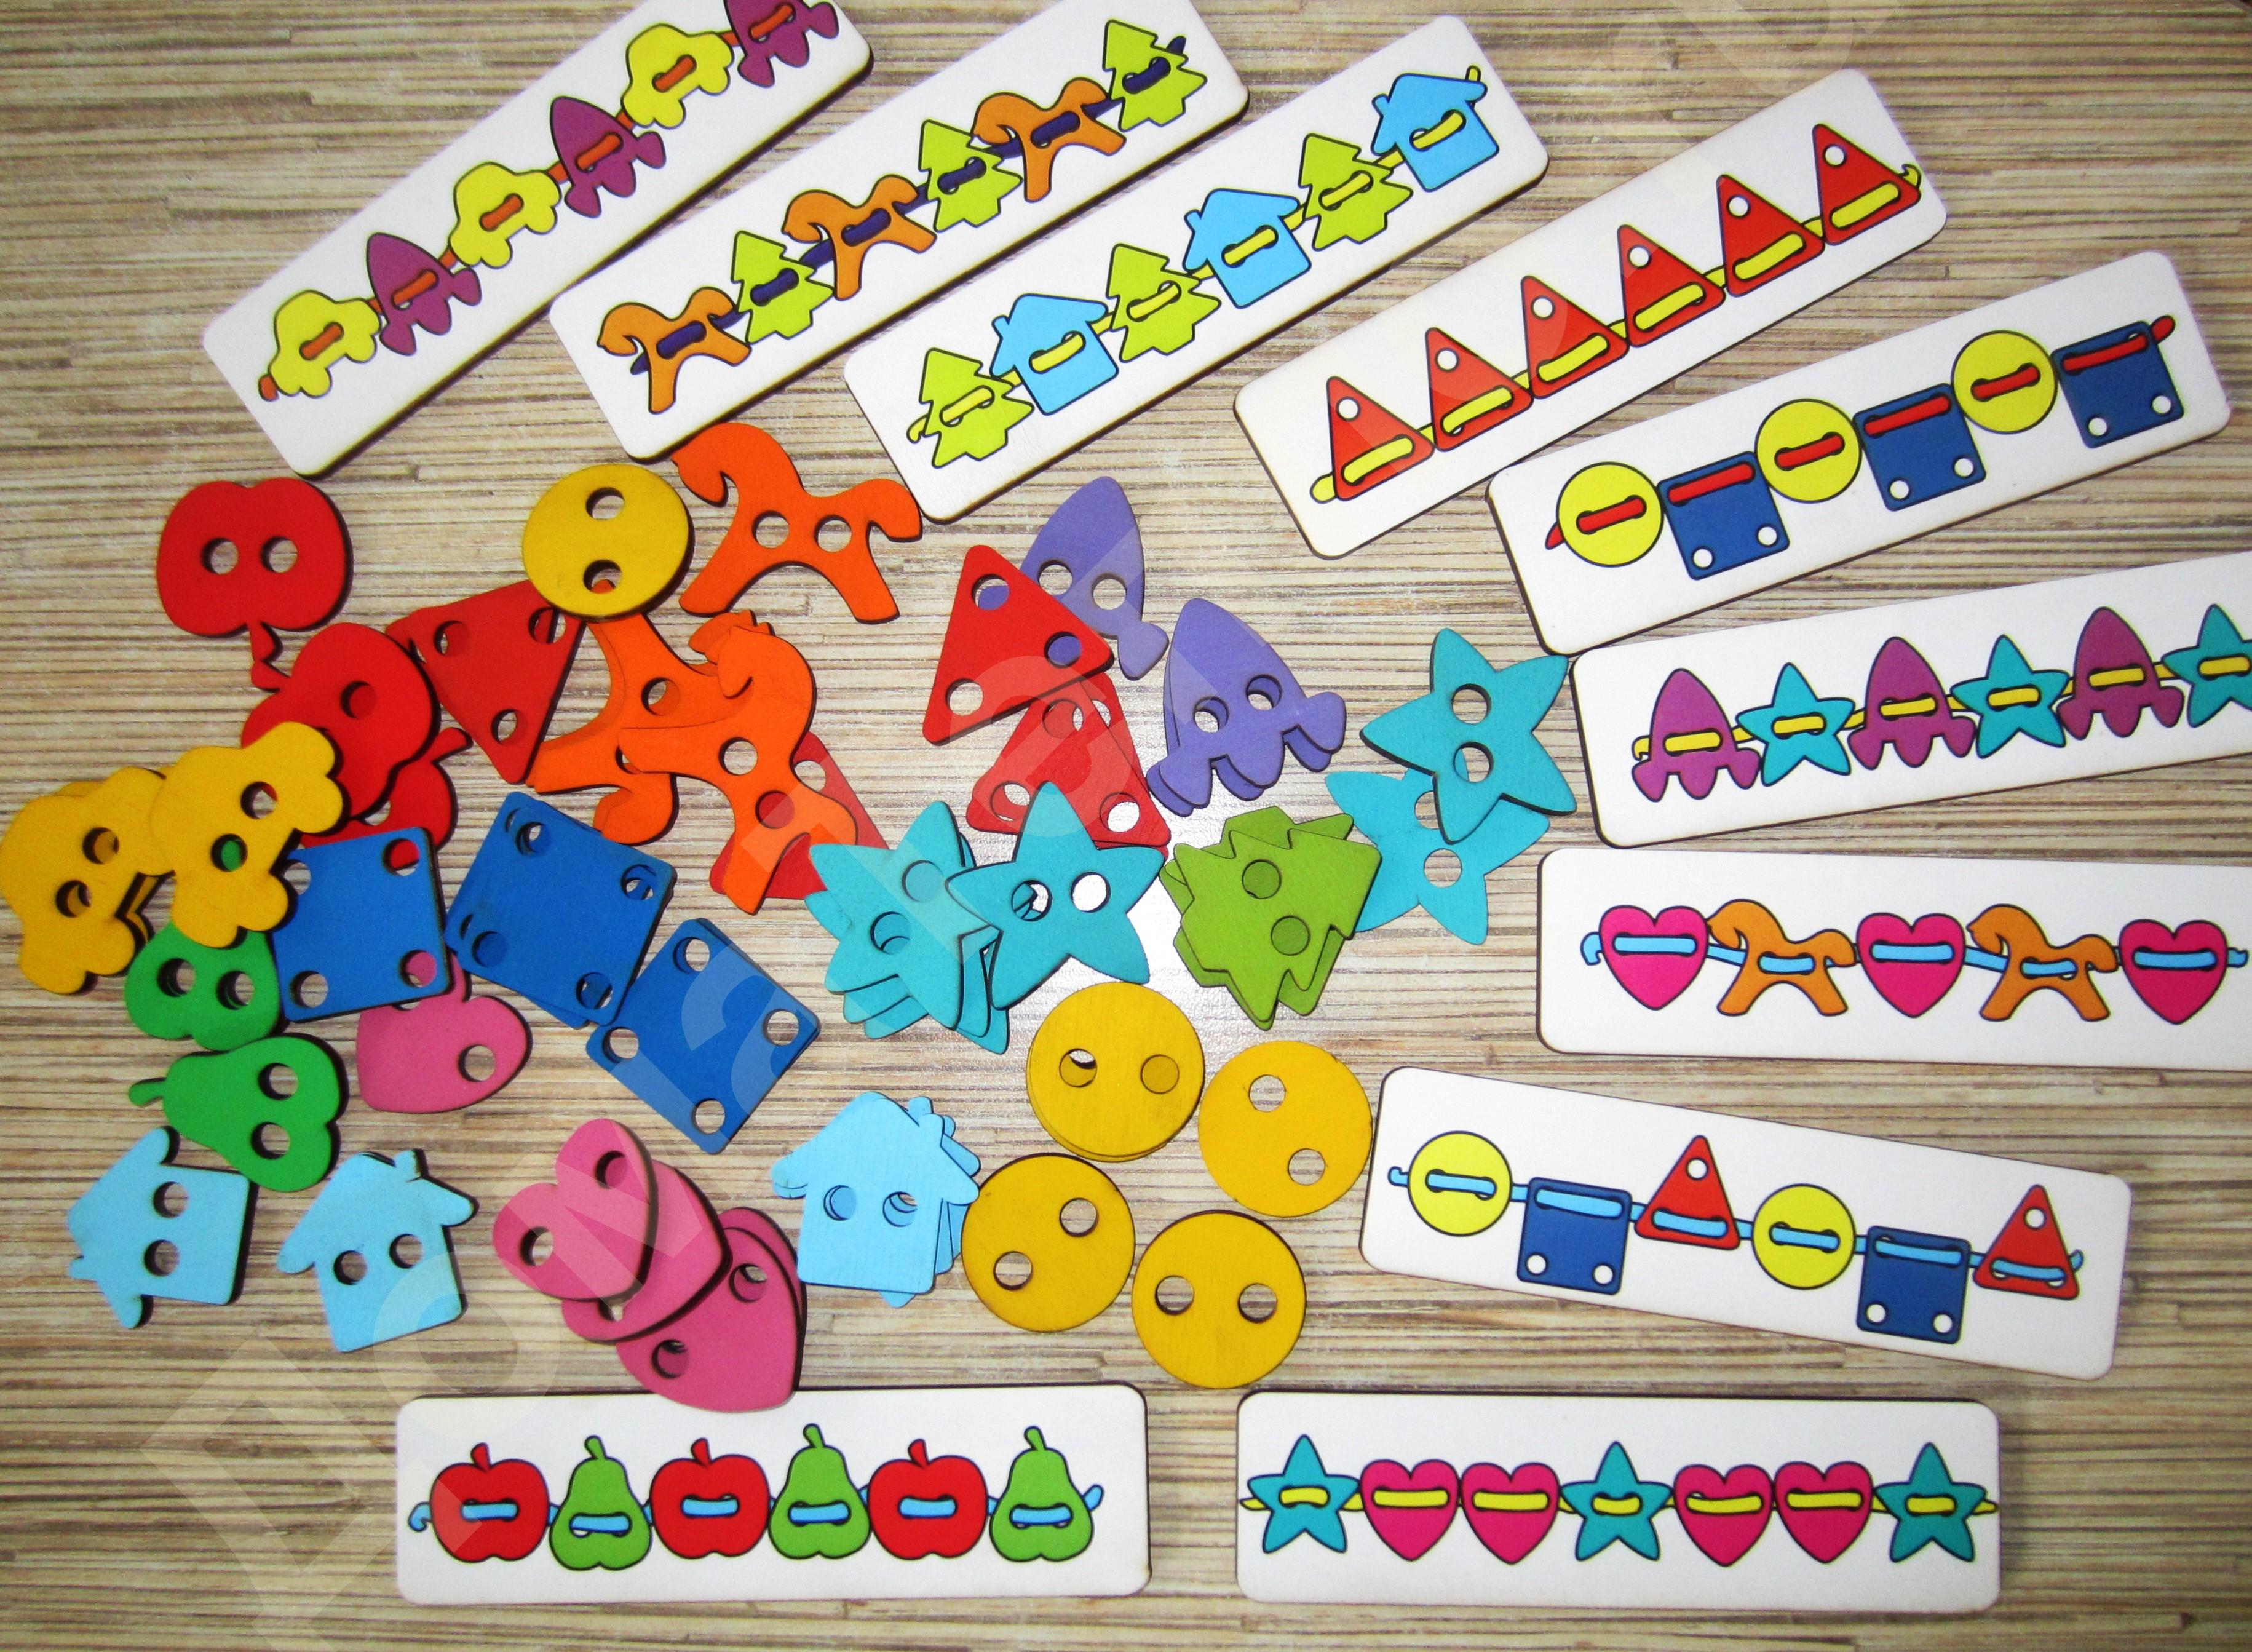 Smile Decor - развивающие игрушки, заготовки для творчества. Авторские методики: Б.П.Никитин, М.Монтессори, Э.Сеген - 5